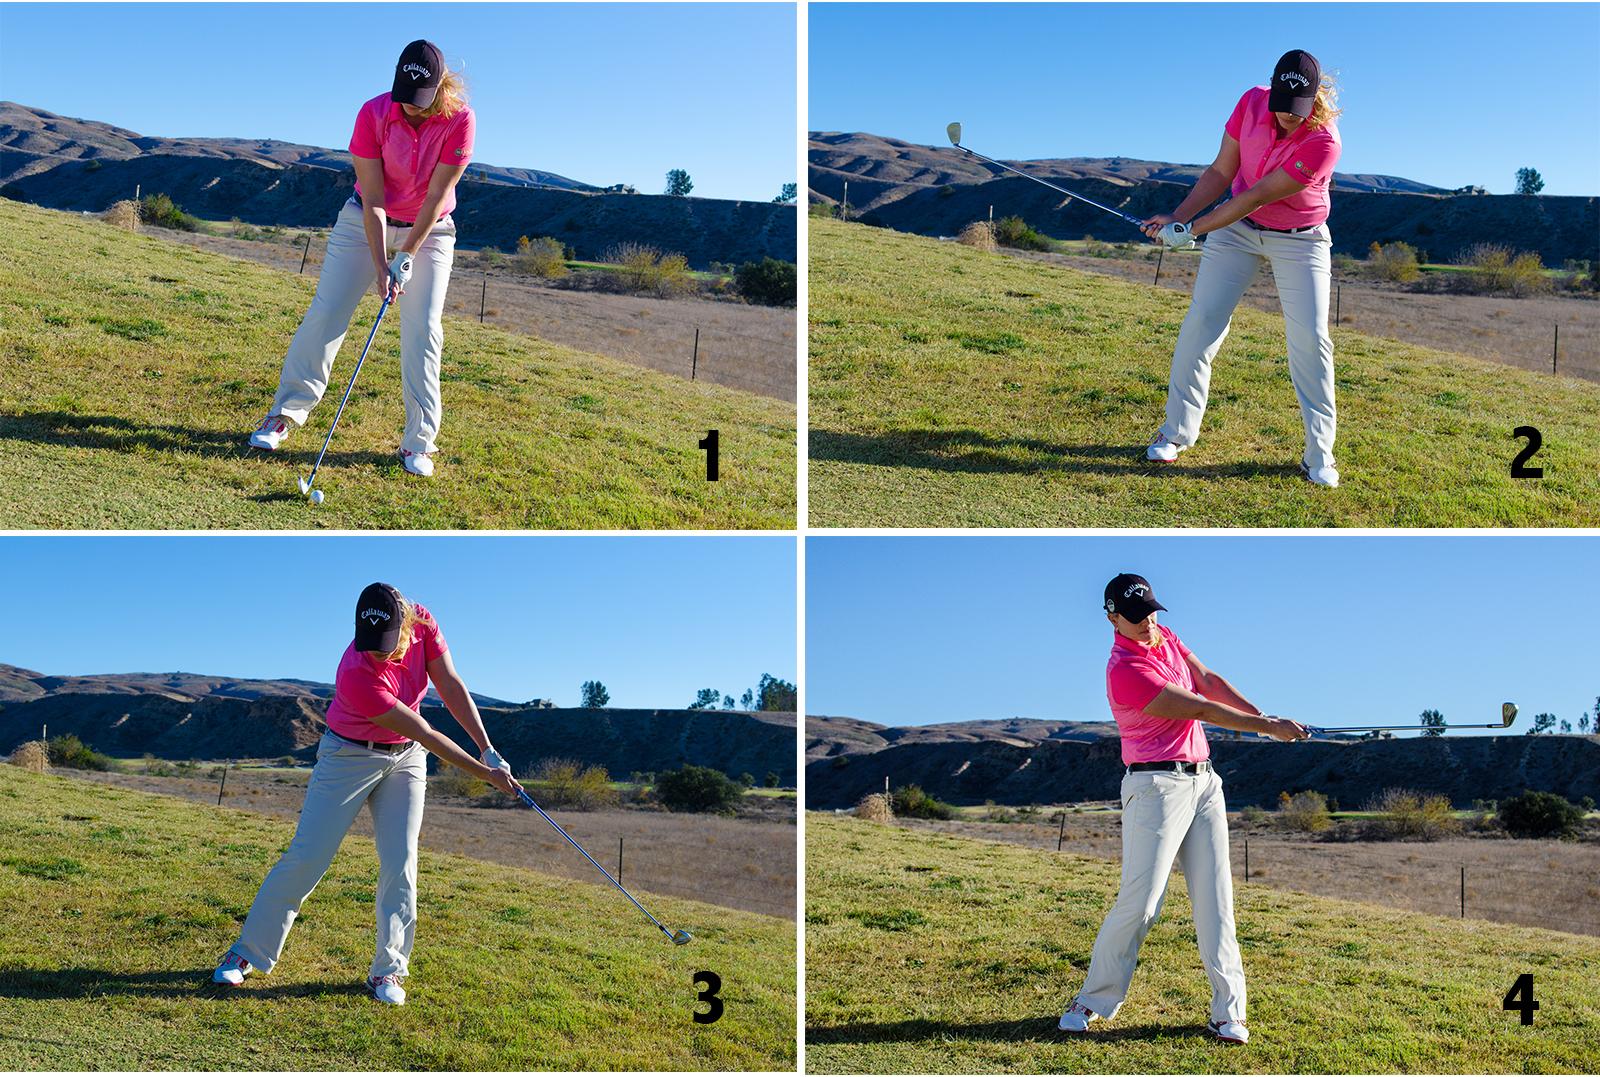 Golf Swing Downhill